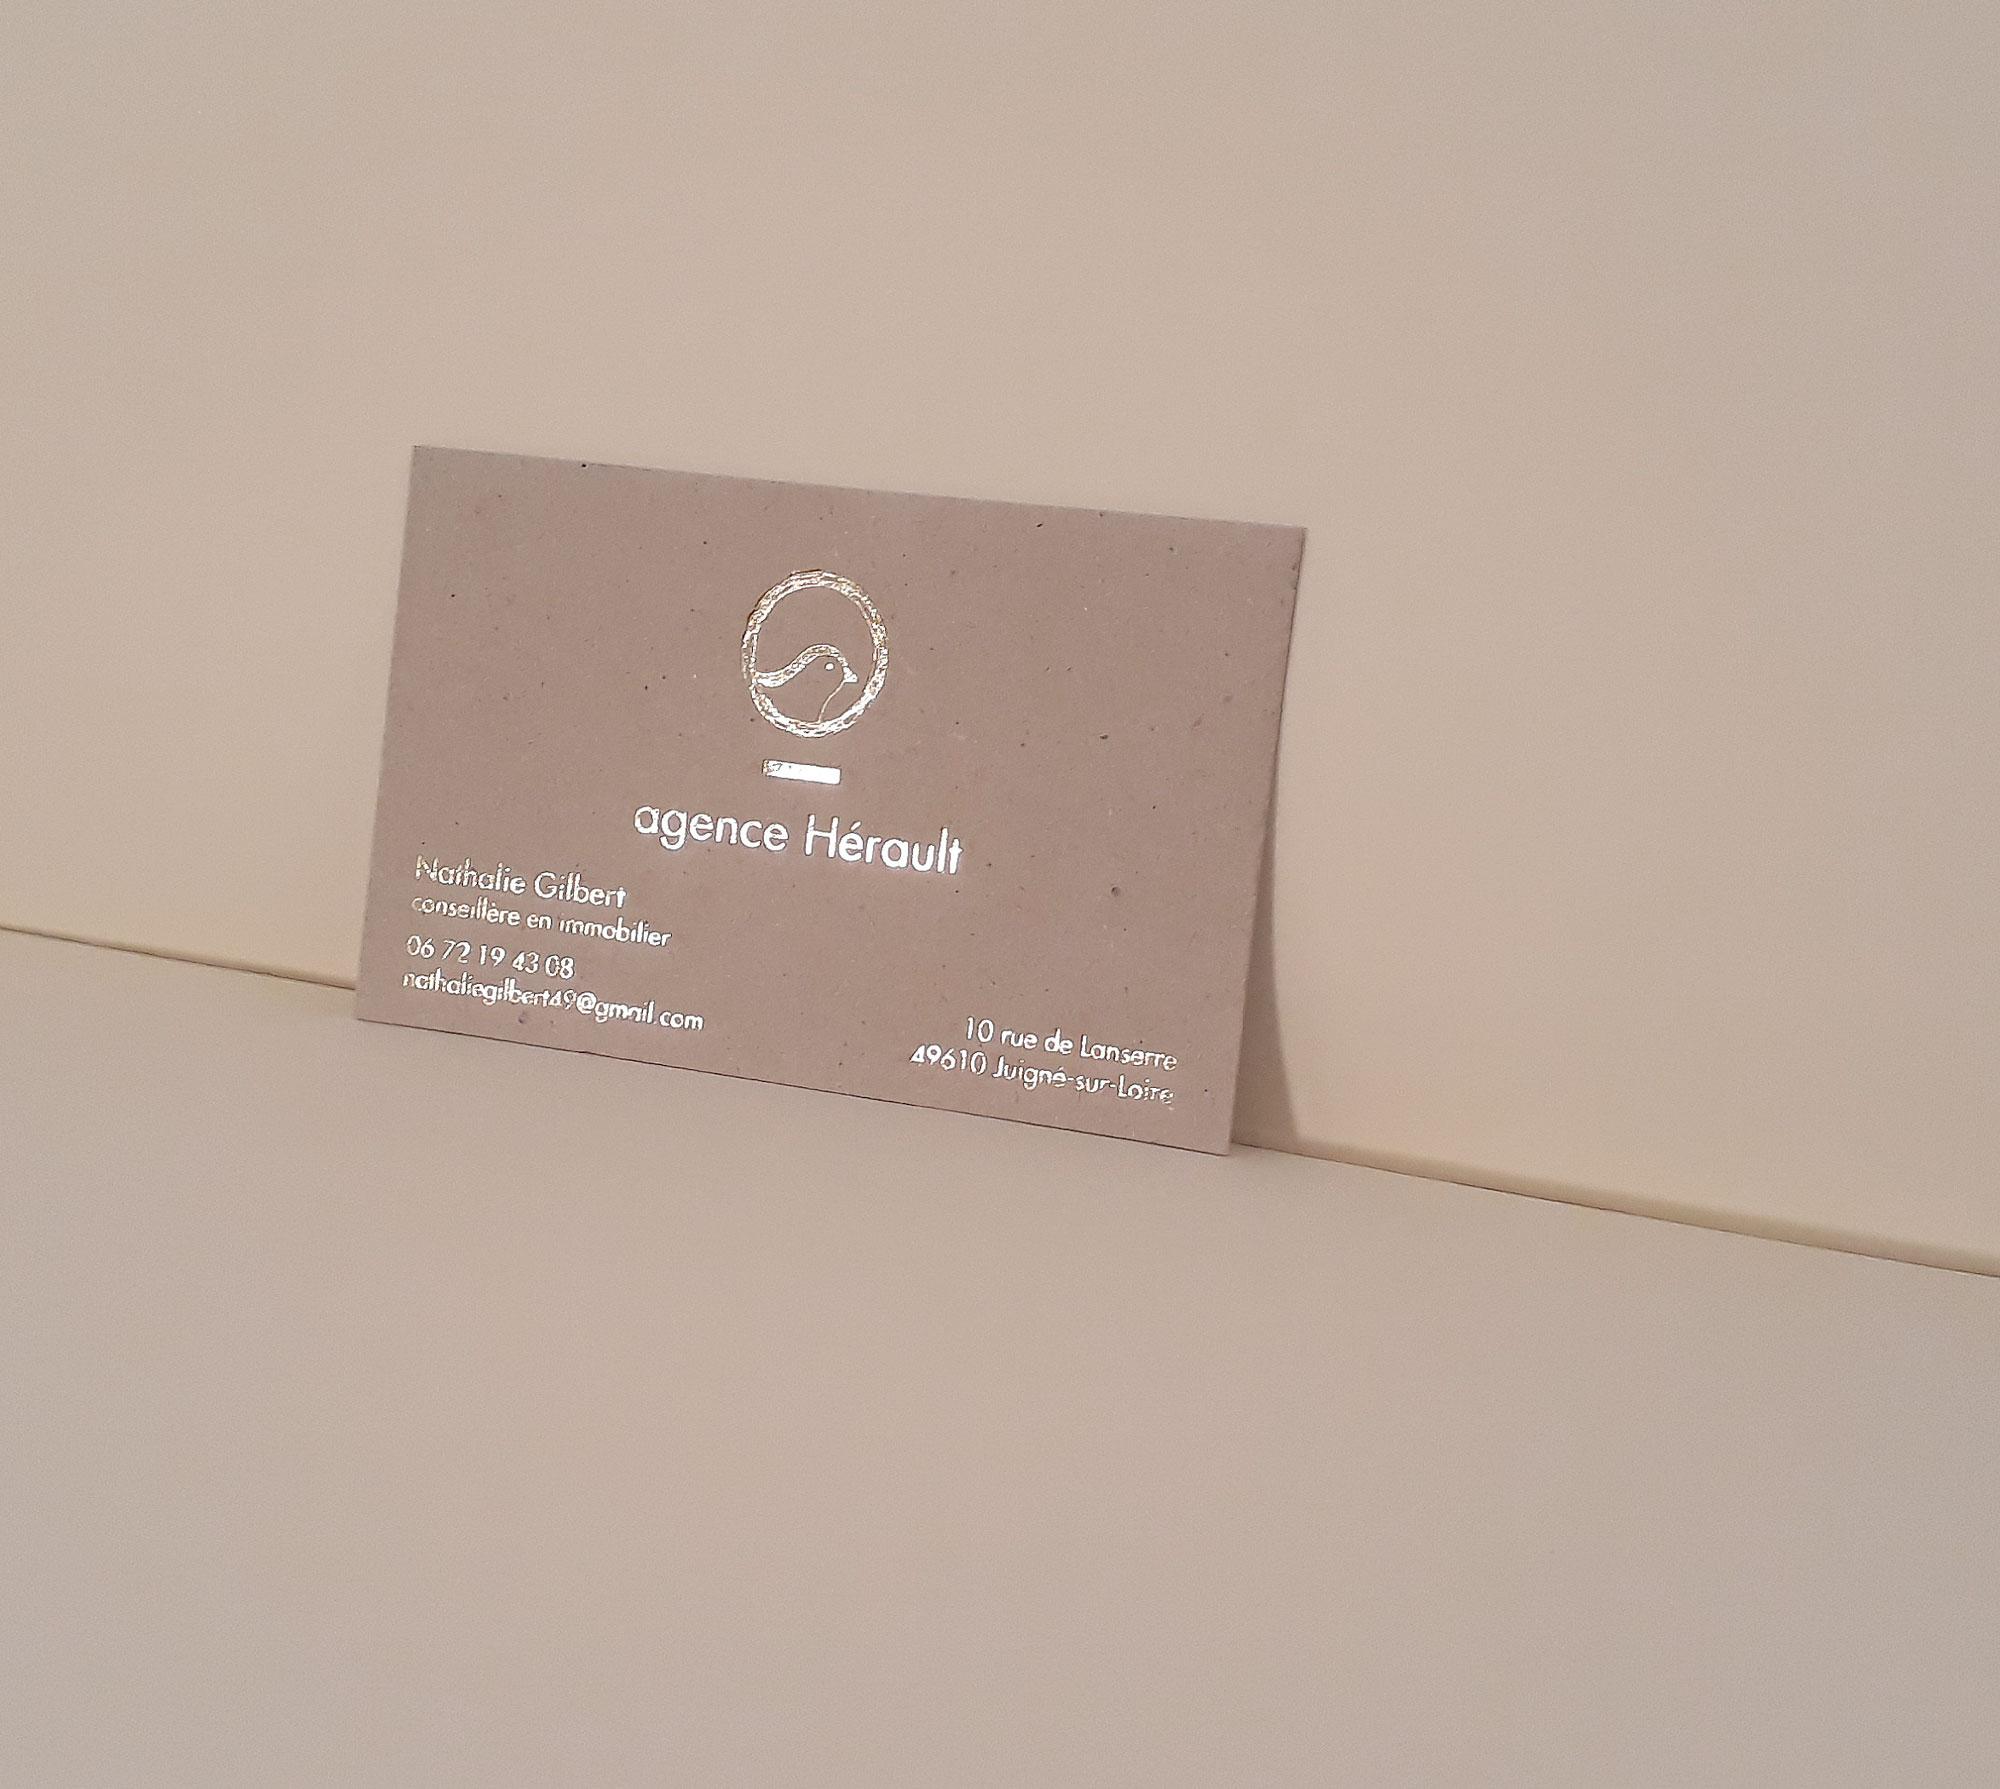 hortense-rossignol-graphiste-angers-carte-de-visite-marquage-a-chaud-or-carton-gris-7